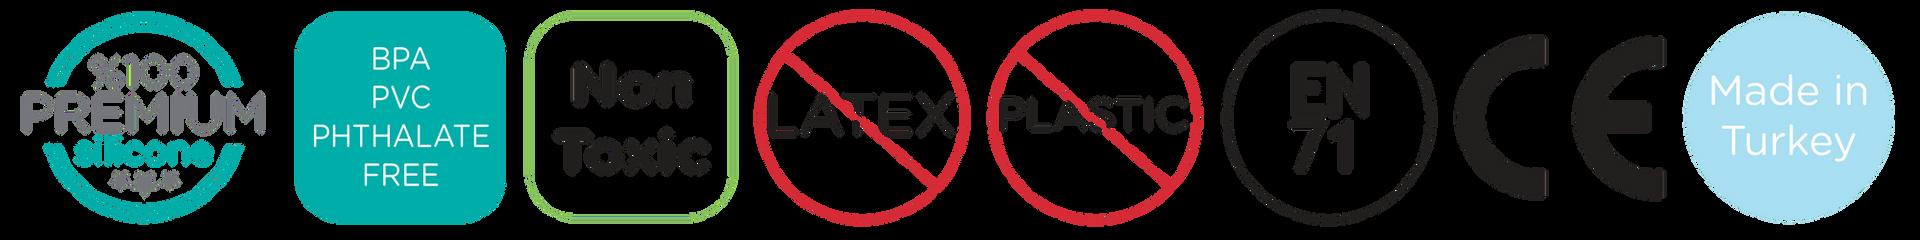 safety logo compressed.png